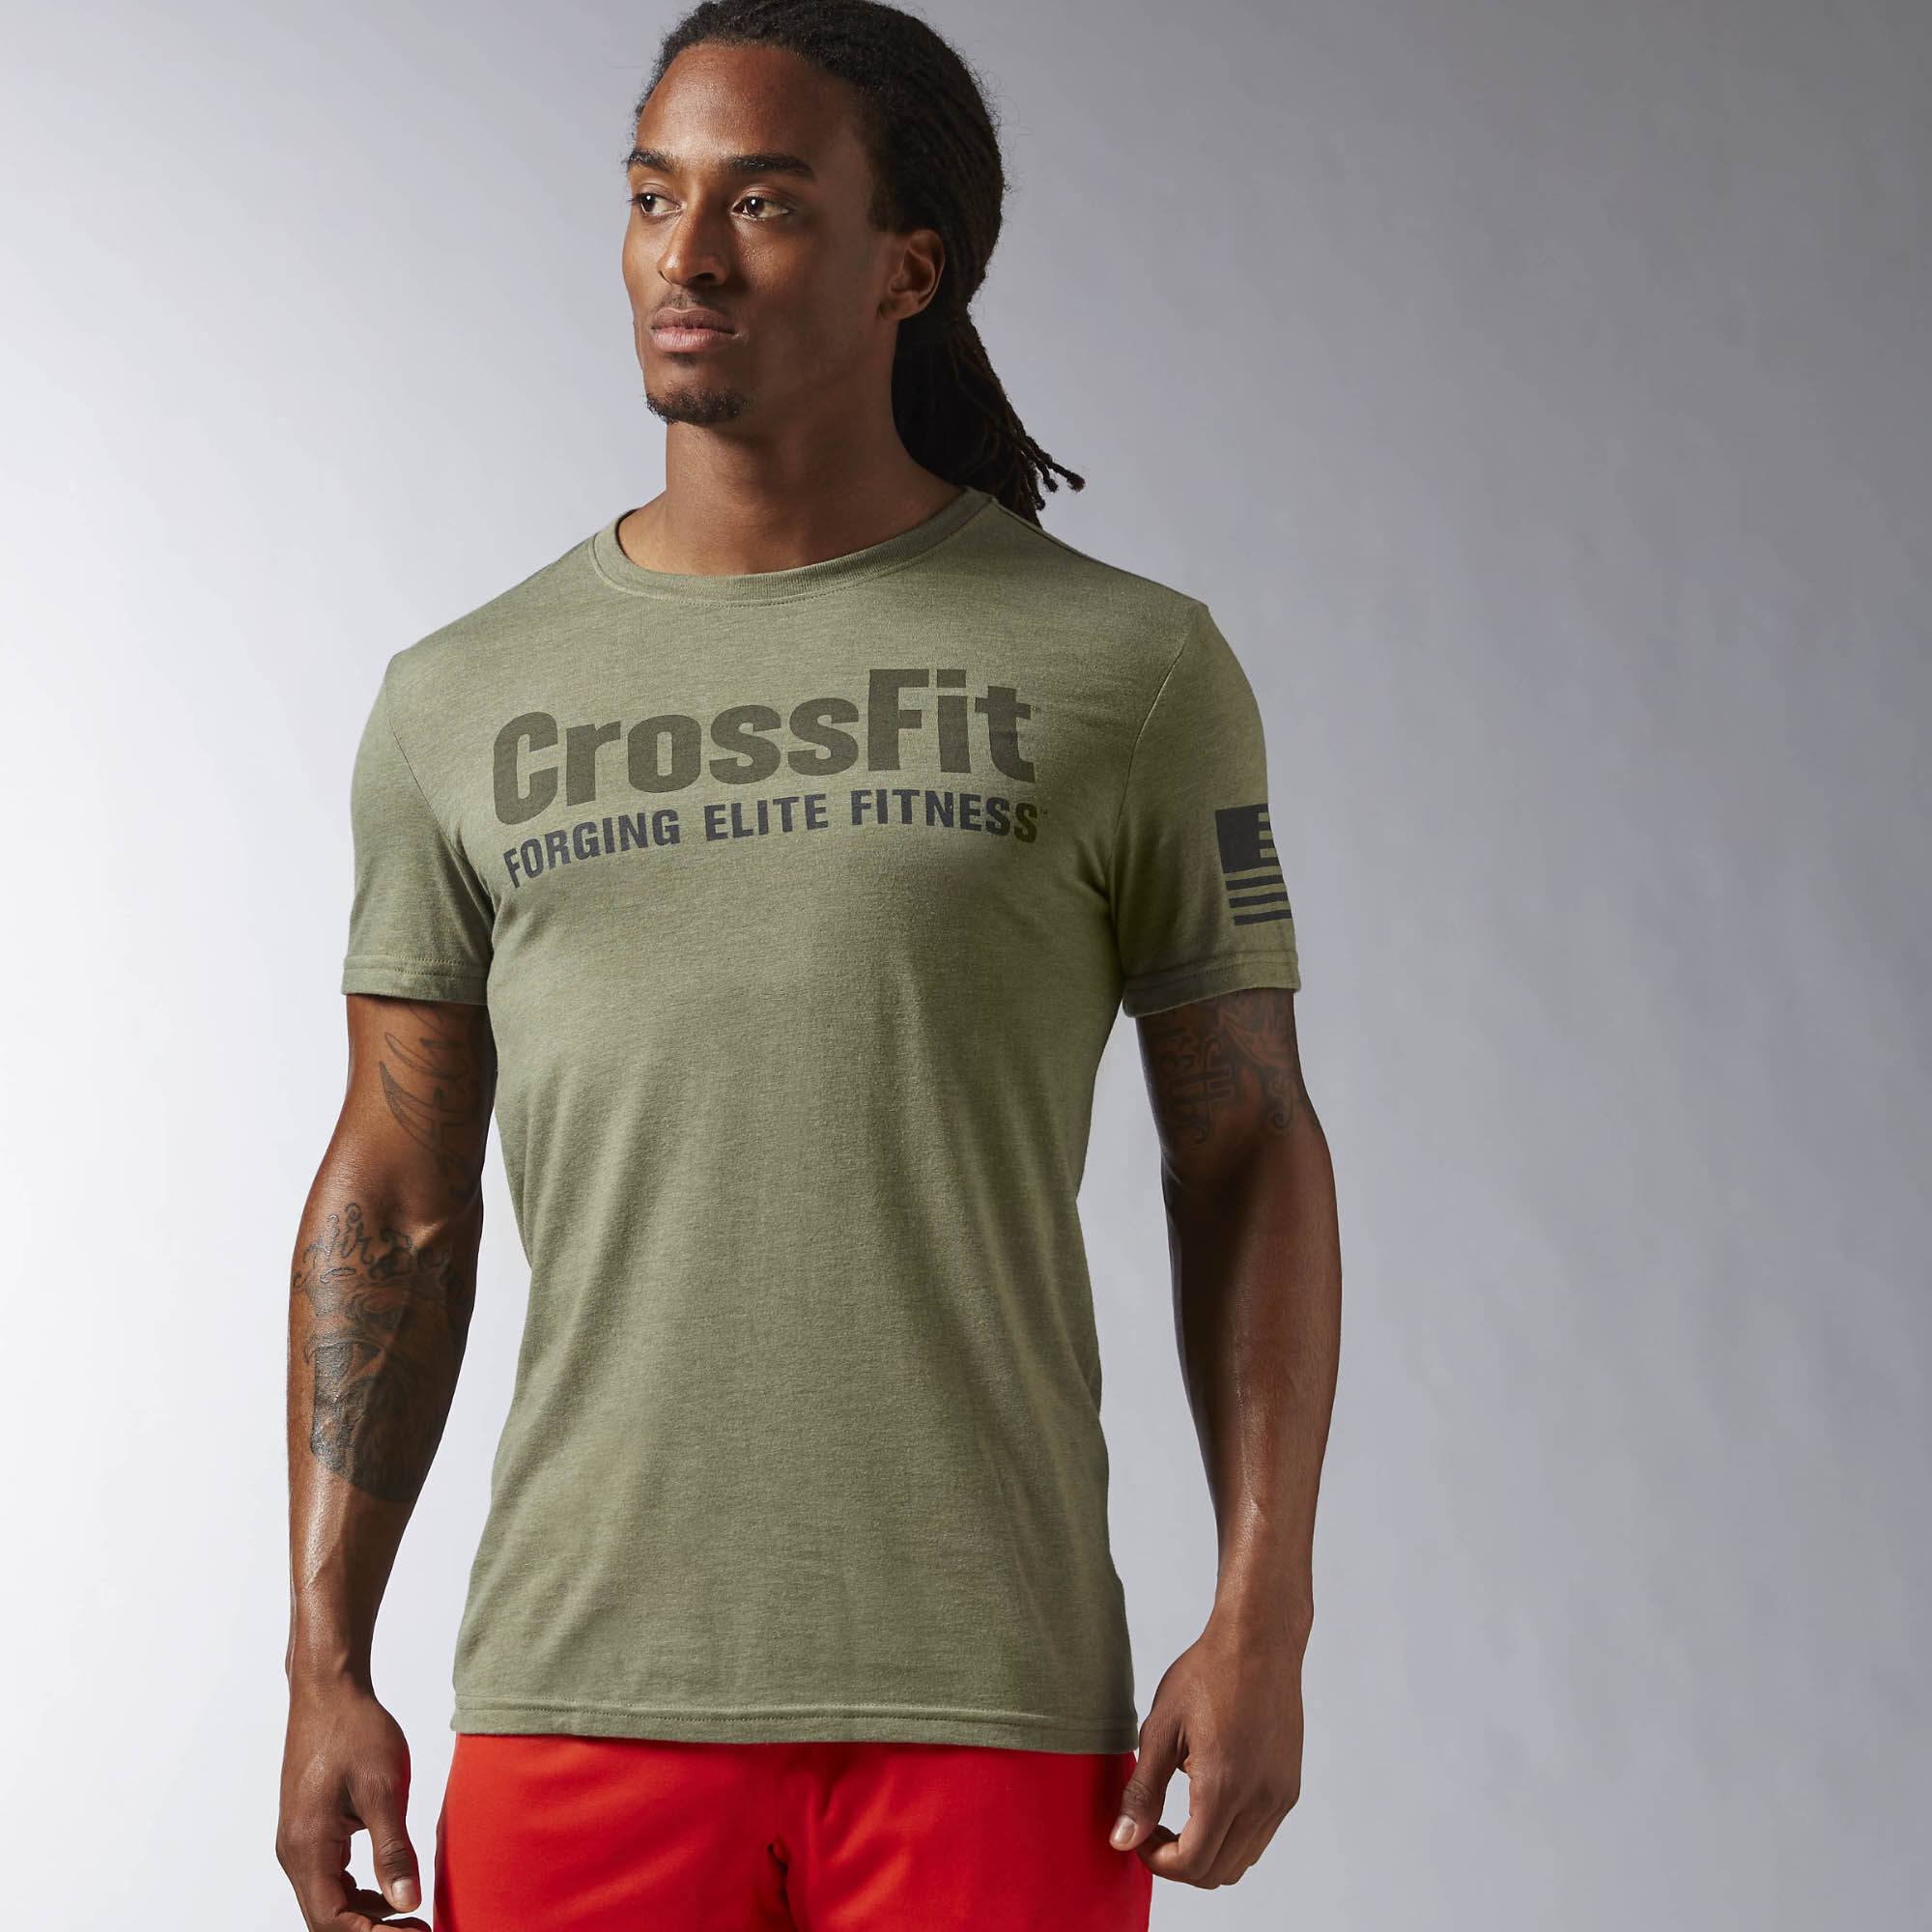 Reebok crossfit forging elite fitness tee for Reebok crossfit t shirts